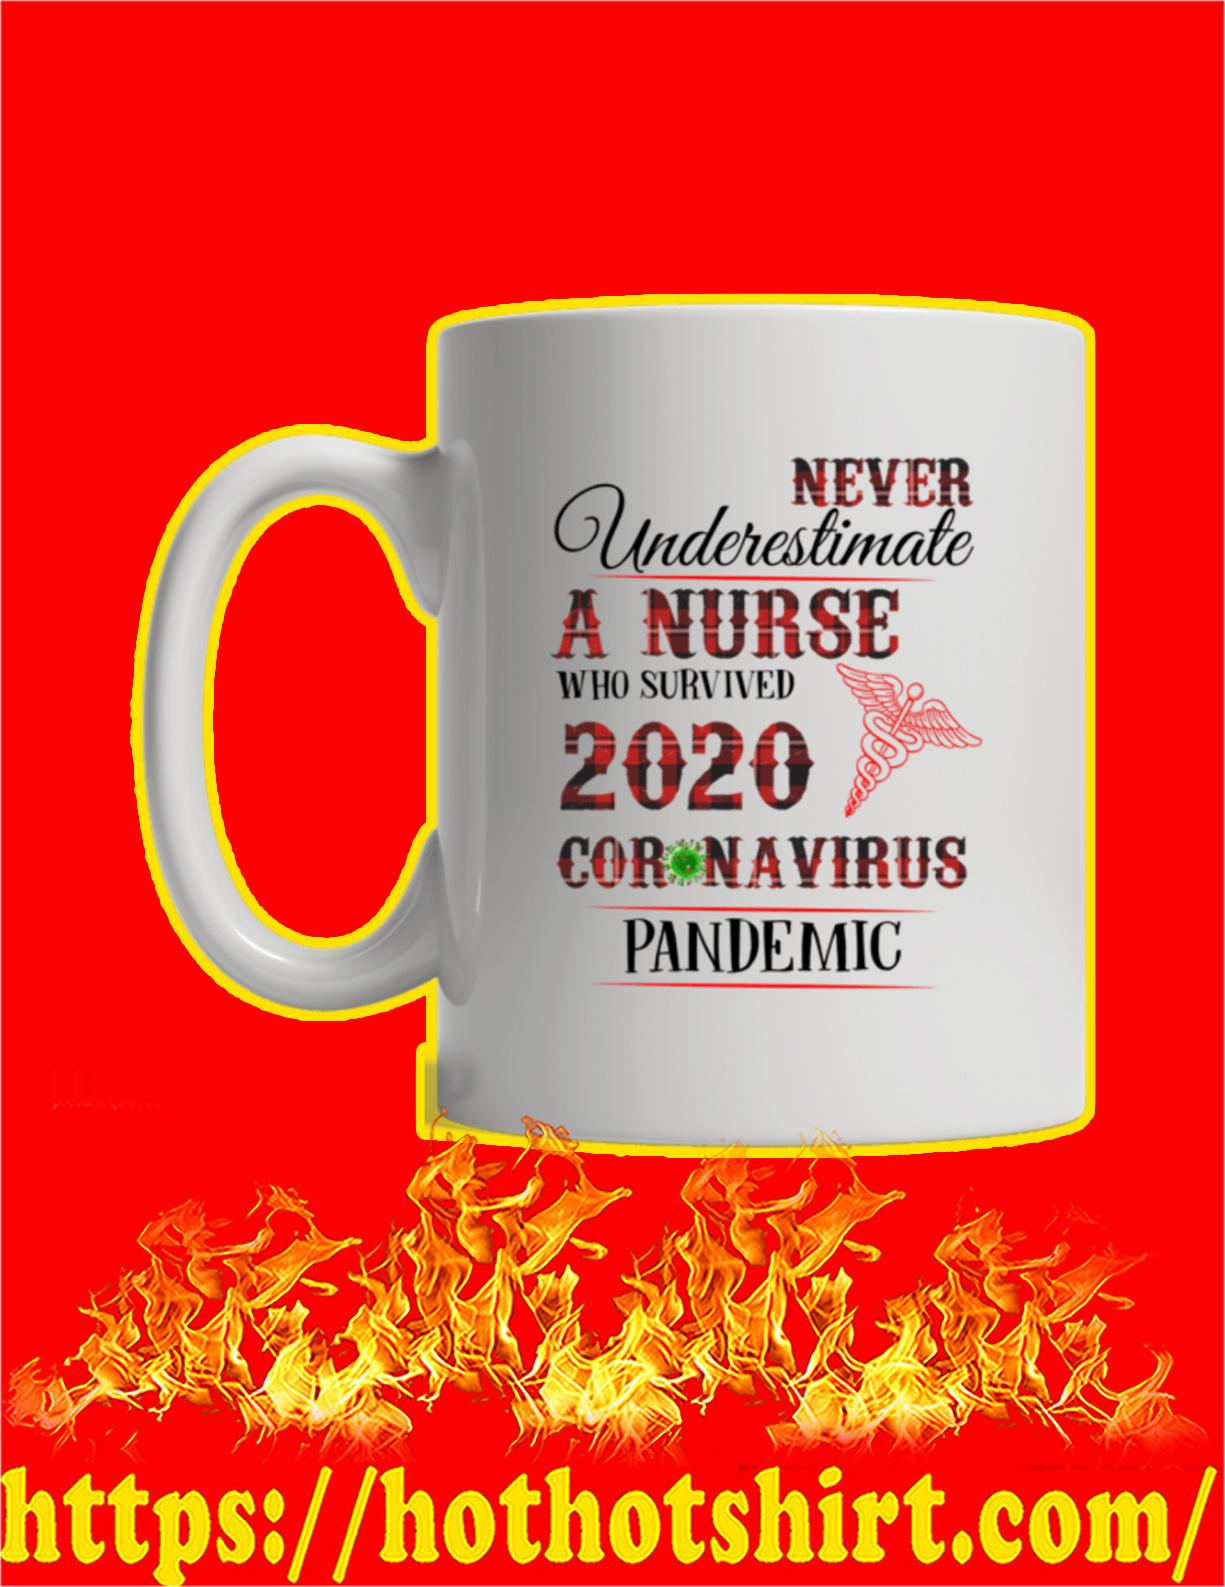 Never Underestimate A Nurse Who Survived 2020 Coronavirus Pandemic Mug